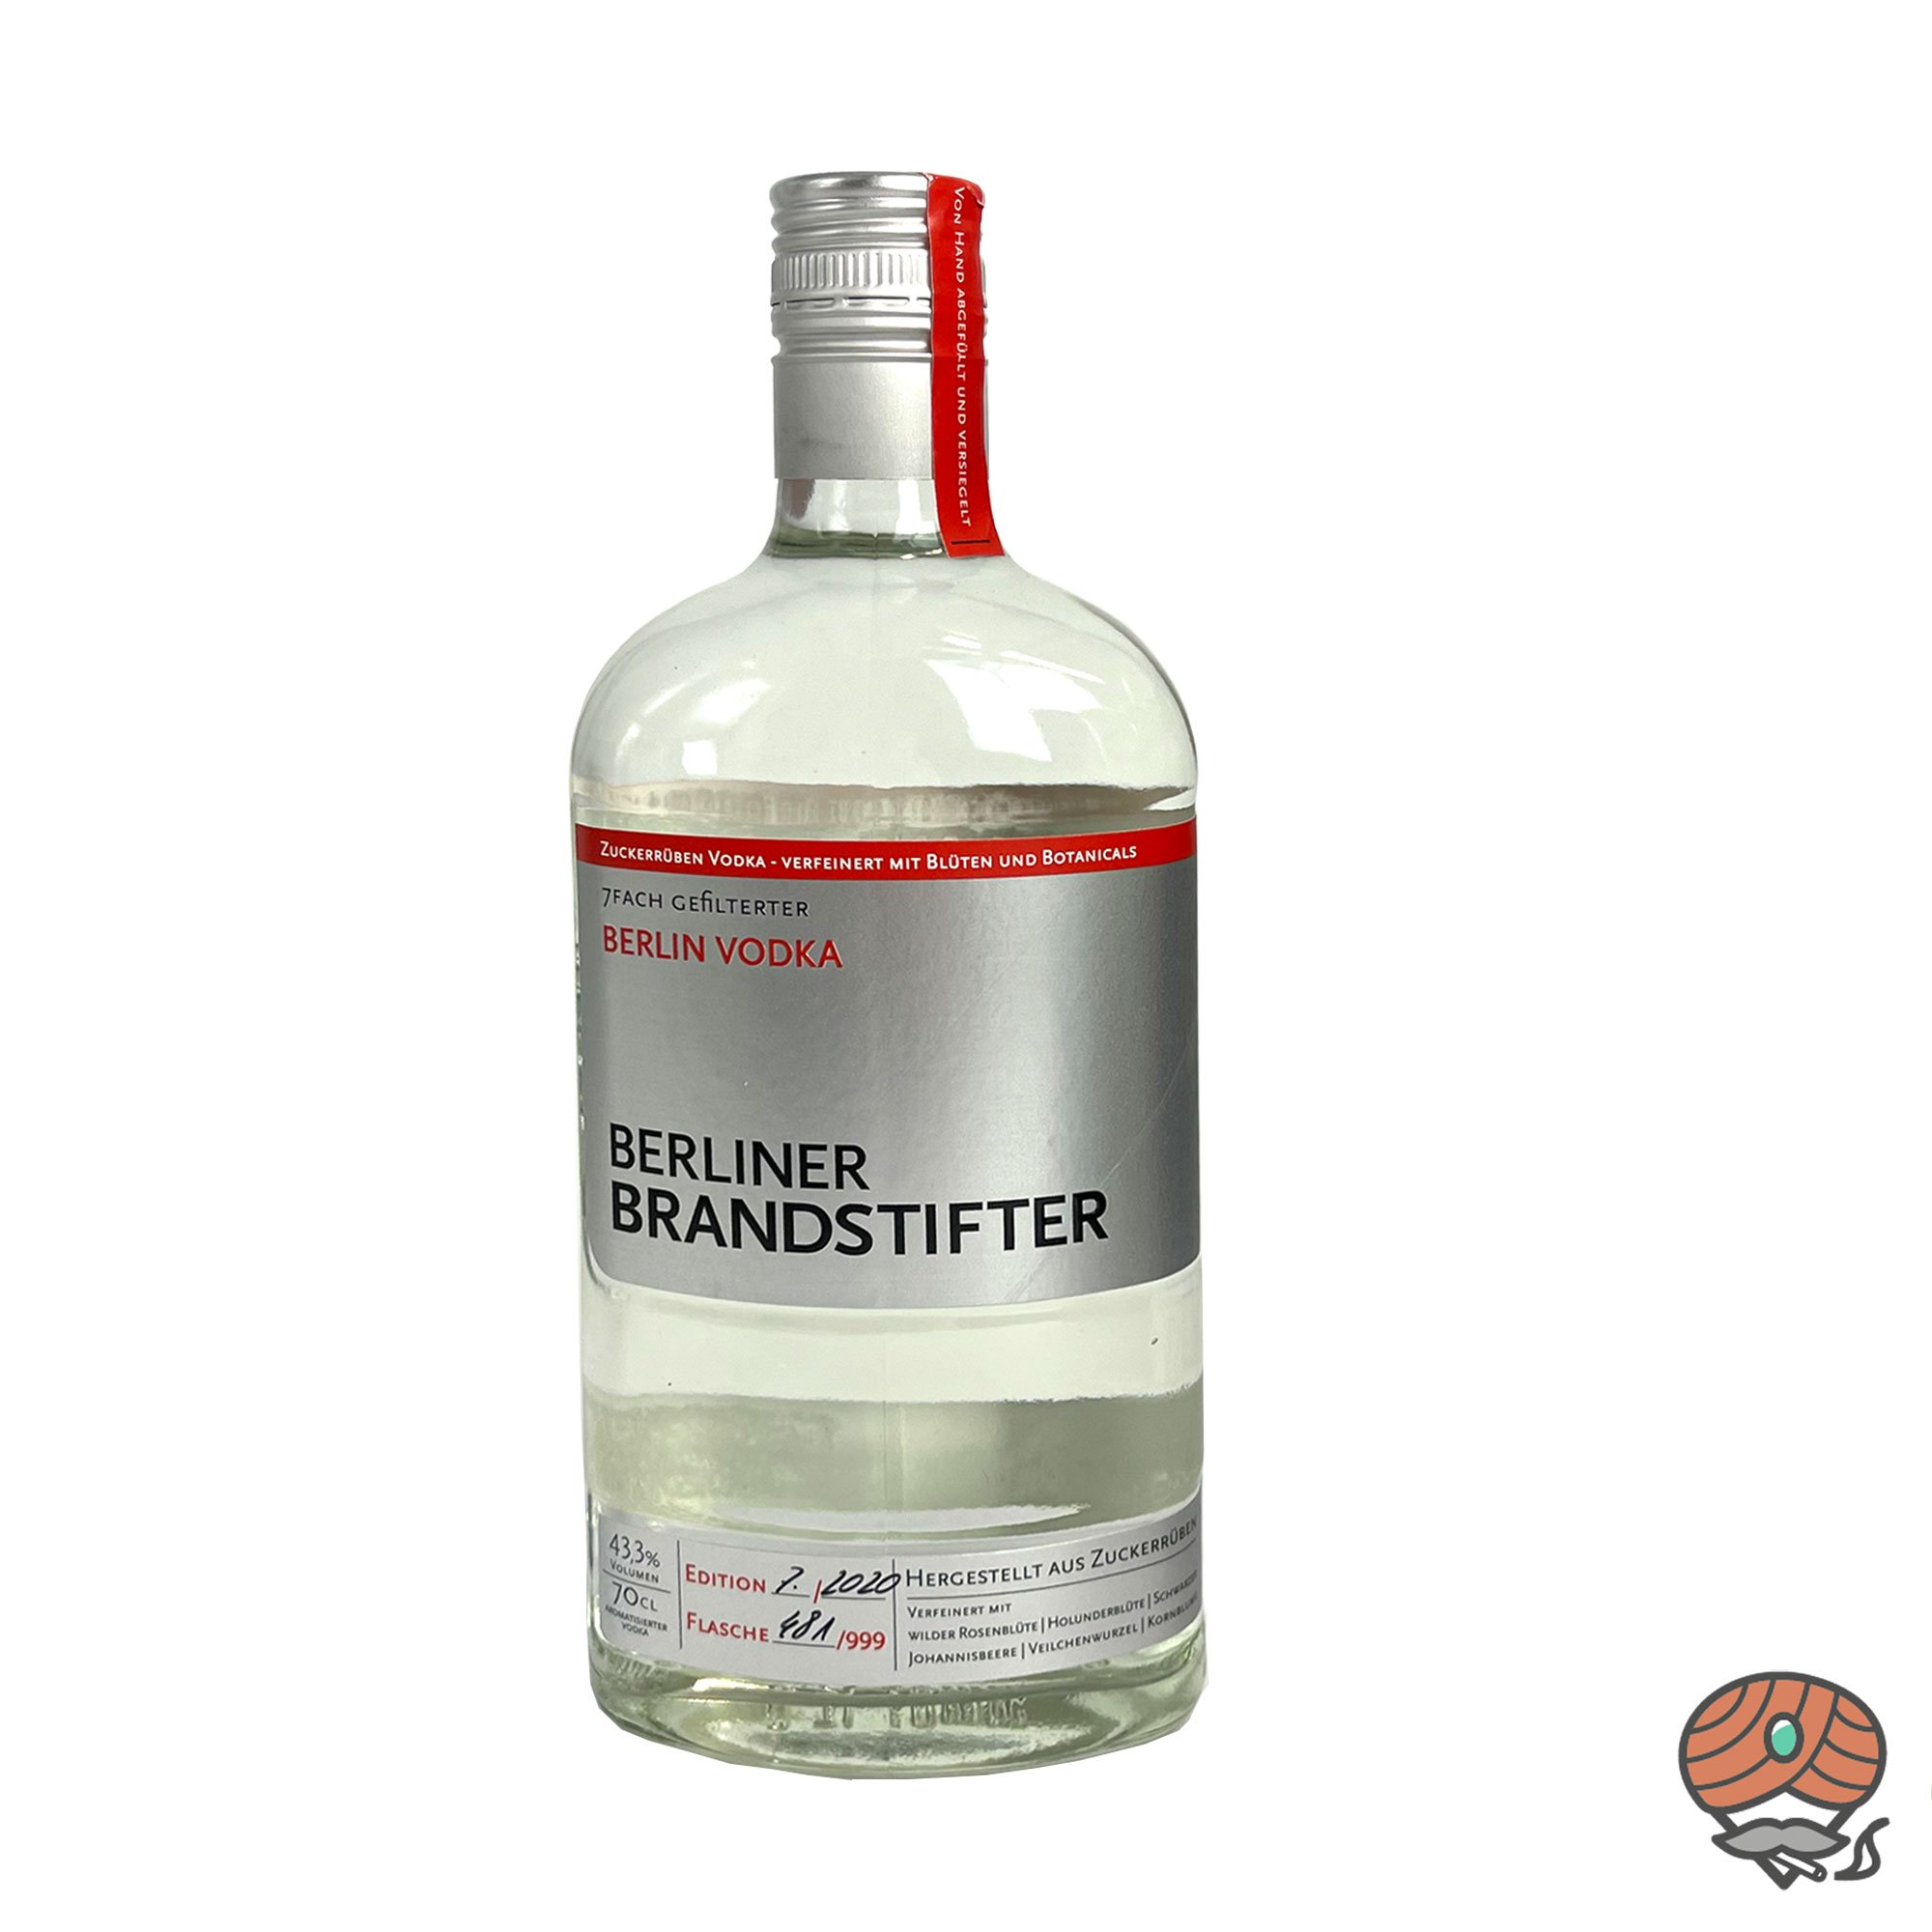 Beliner Brandstifter - Berlin Vodka 0,7l, alc. 43,3 Vol.-%